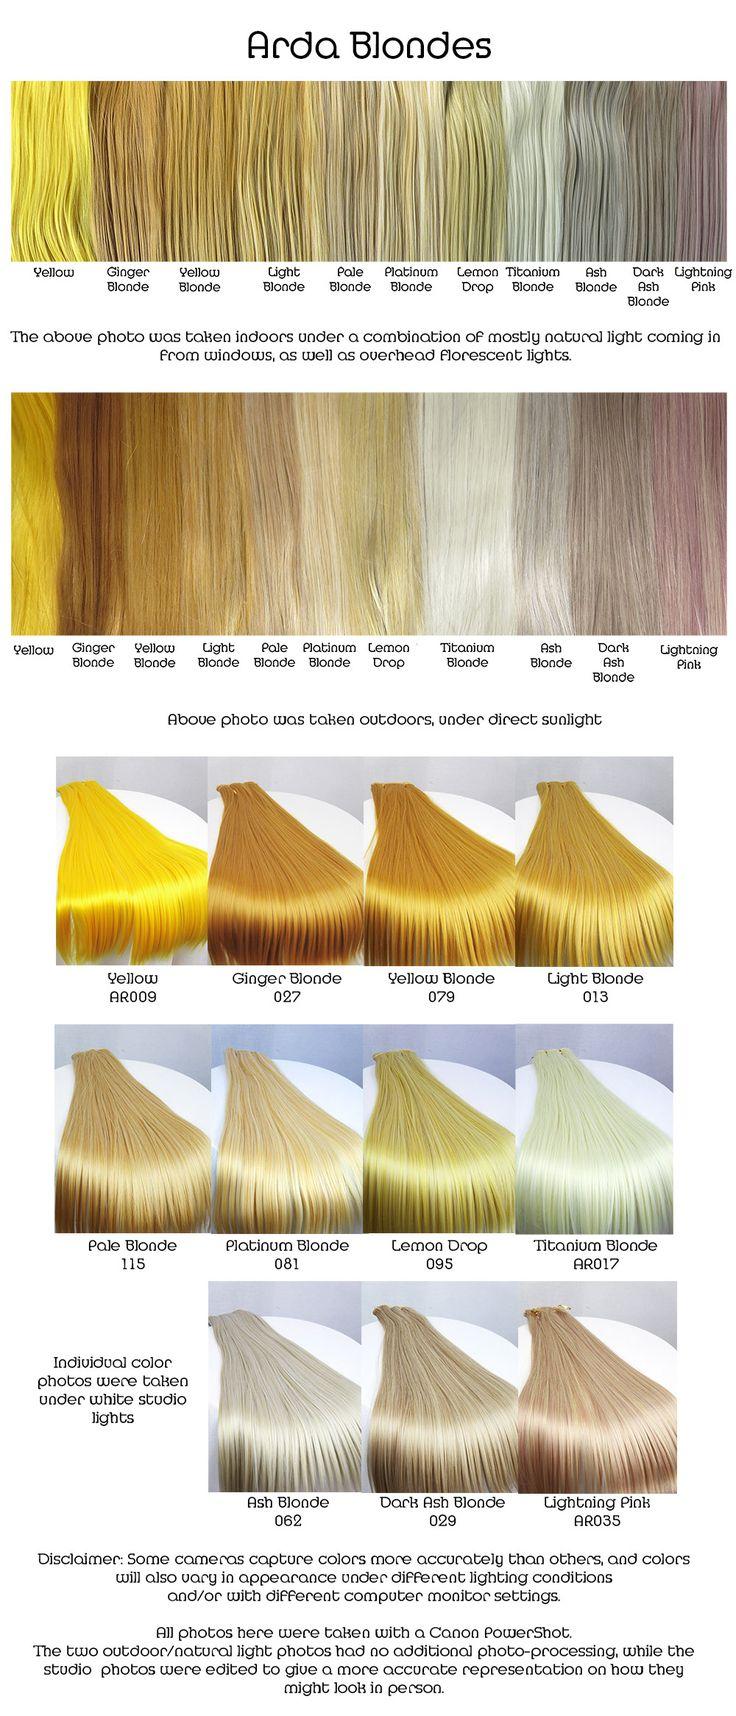 http://cdn.shopify.com/s/files/1/0121/6592/files/Blondes_redux.jpg?2992